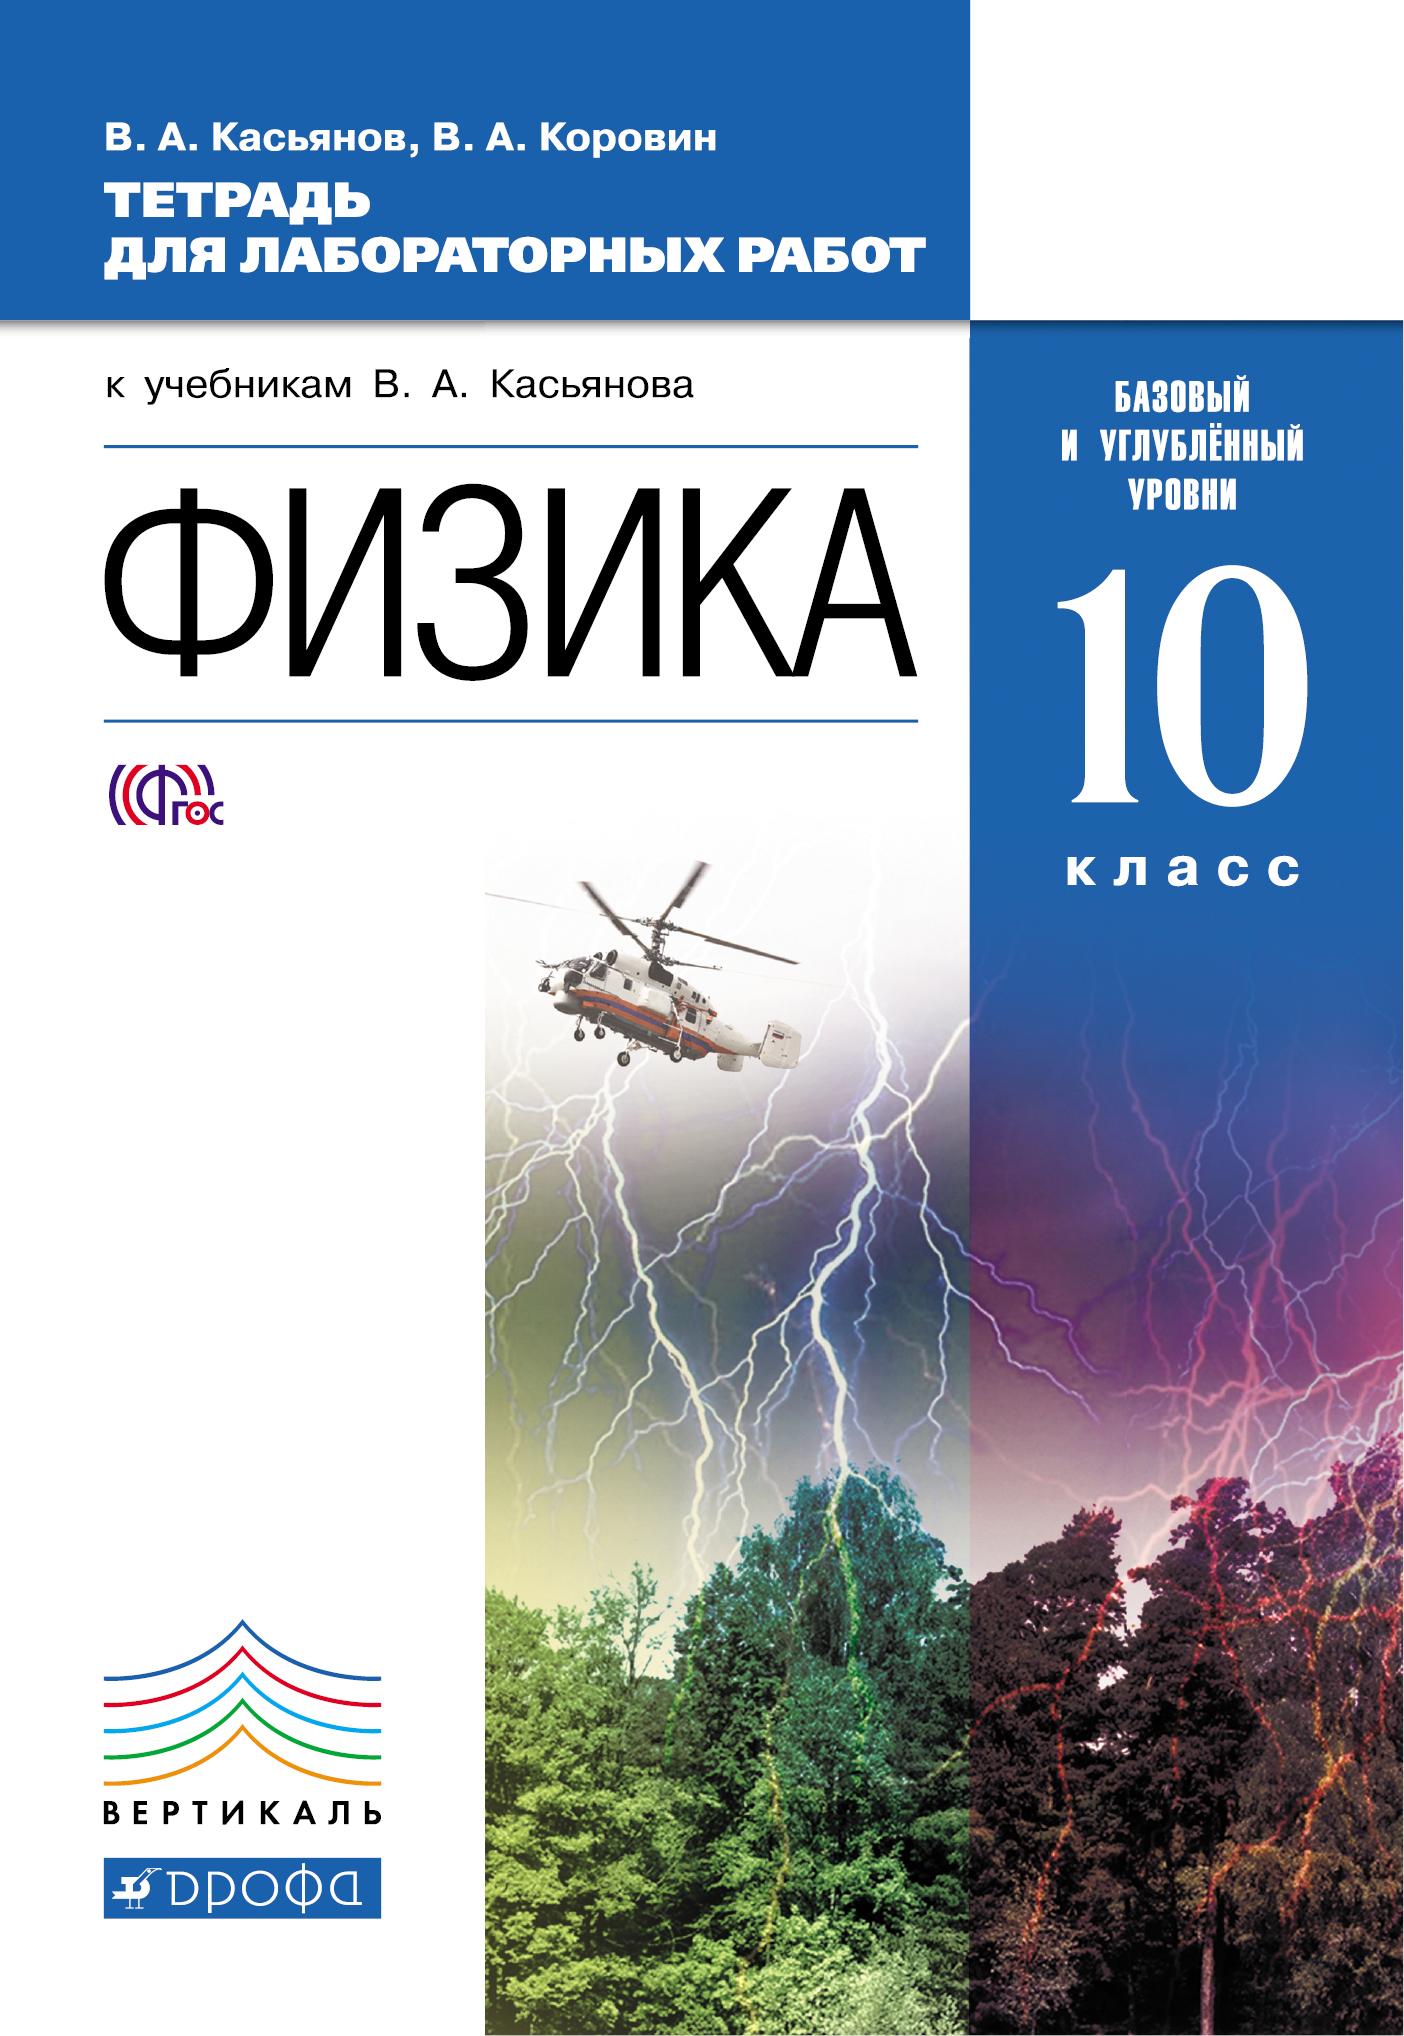 Физика 10кл [Тет.д/лаб.раб.]баз и угл.ур.Вертикаль